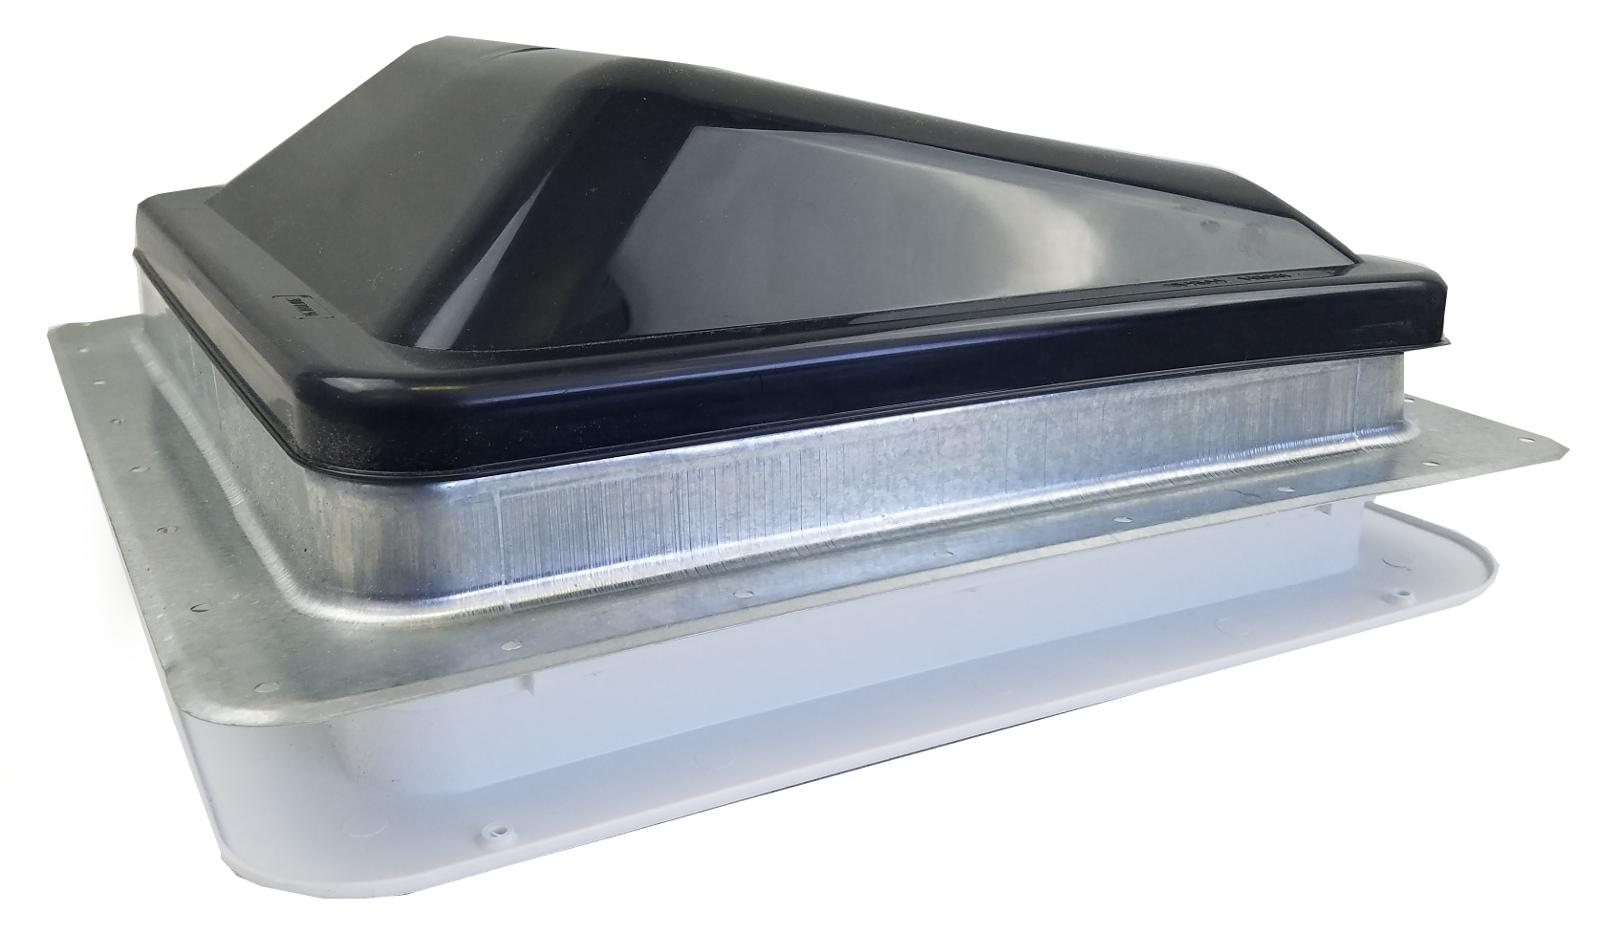 V20923p 29 Ventline 14 Rv Roof Vent W Smoke Lid Class A Customs Classacustoms